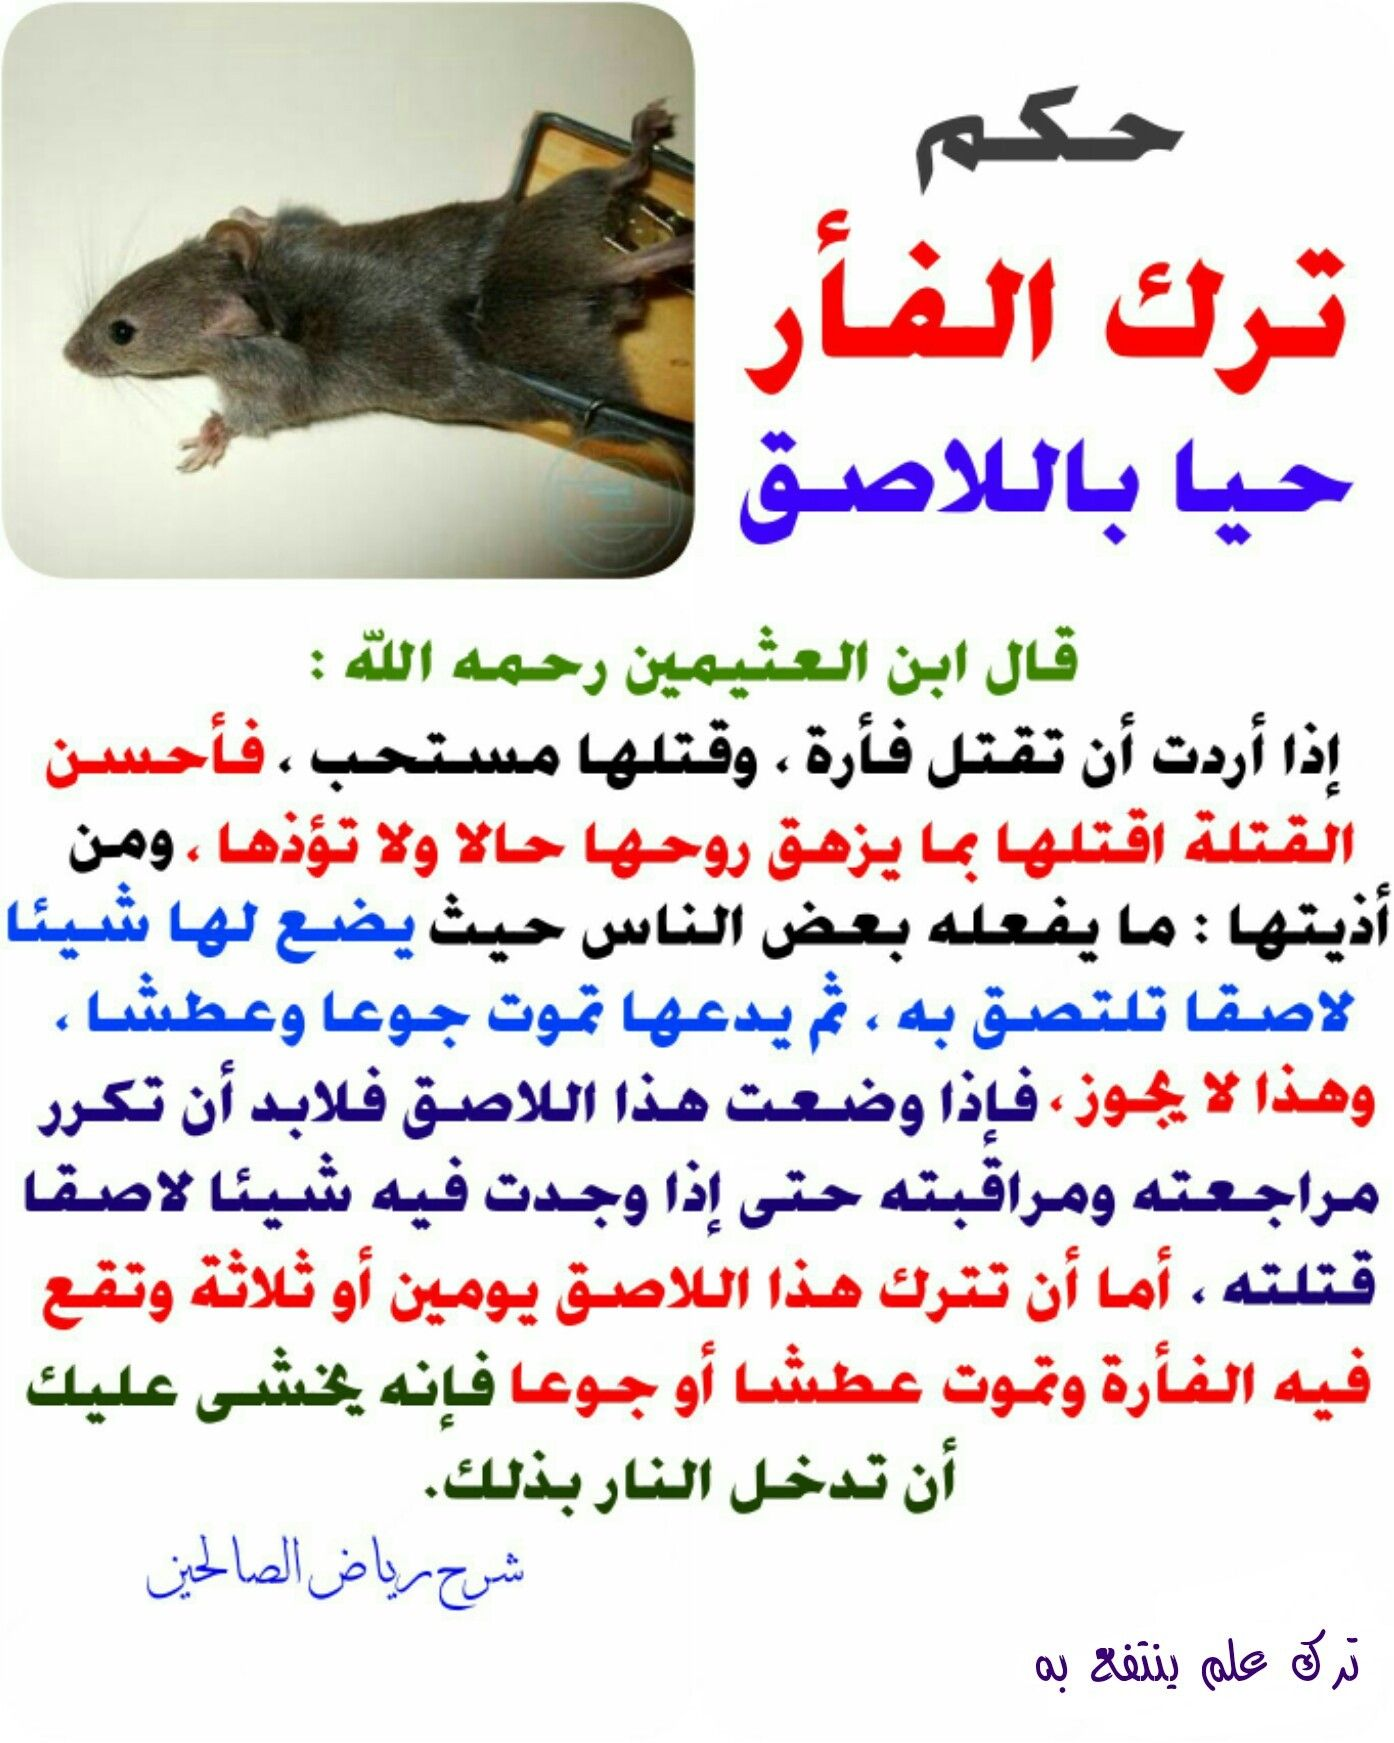 حكم ترك الفأر حيا باللاصق Islamic Quotes Fake Girls Arabic Quotes